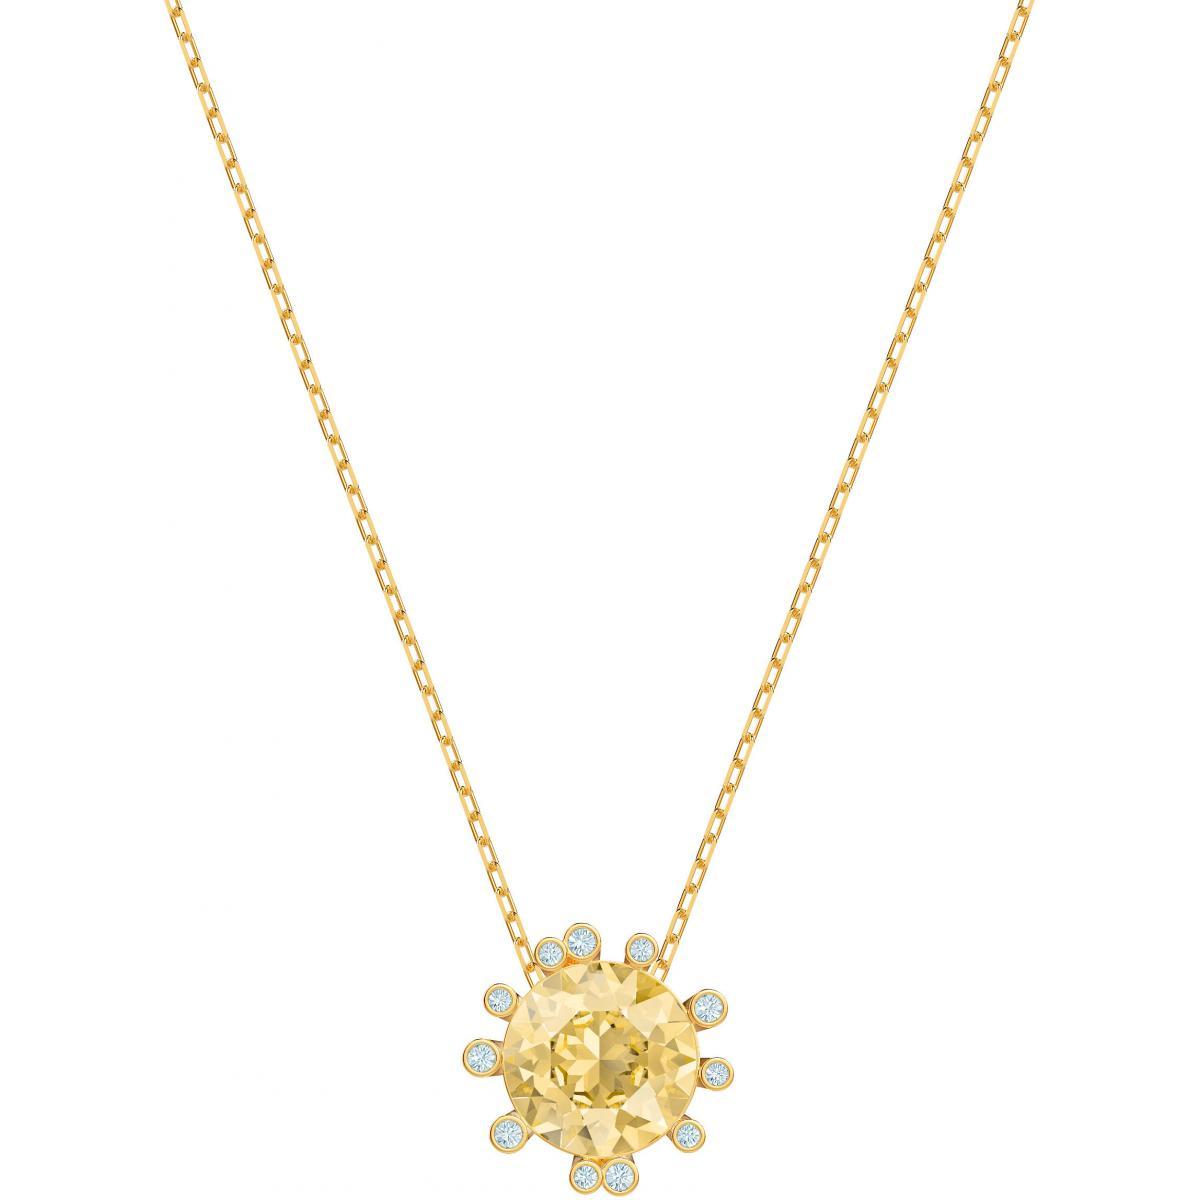 Collier et pendentif Swarovski 5460988 - Collier et pendentif Fleur D'Eclat  Jaune Femme